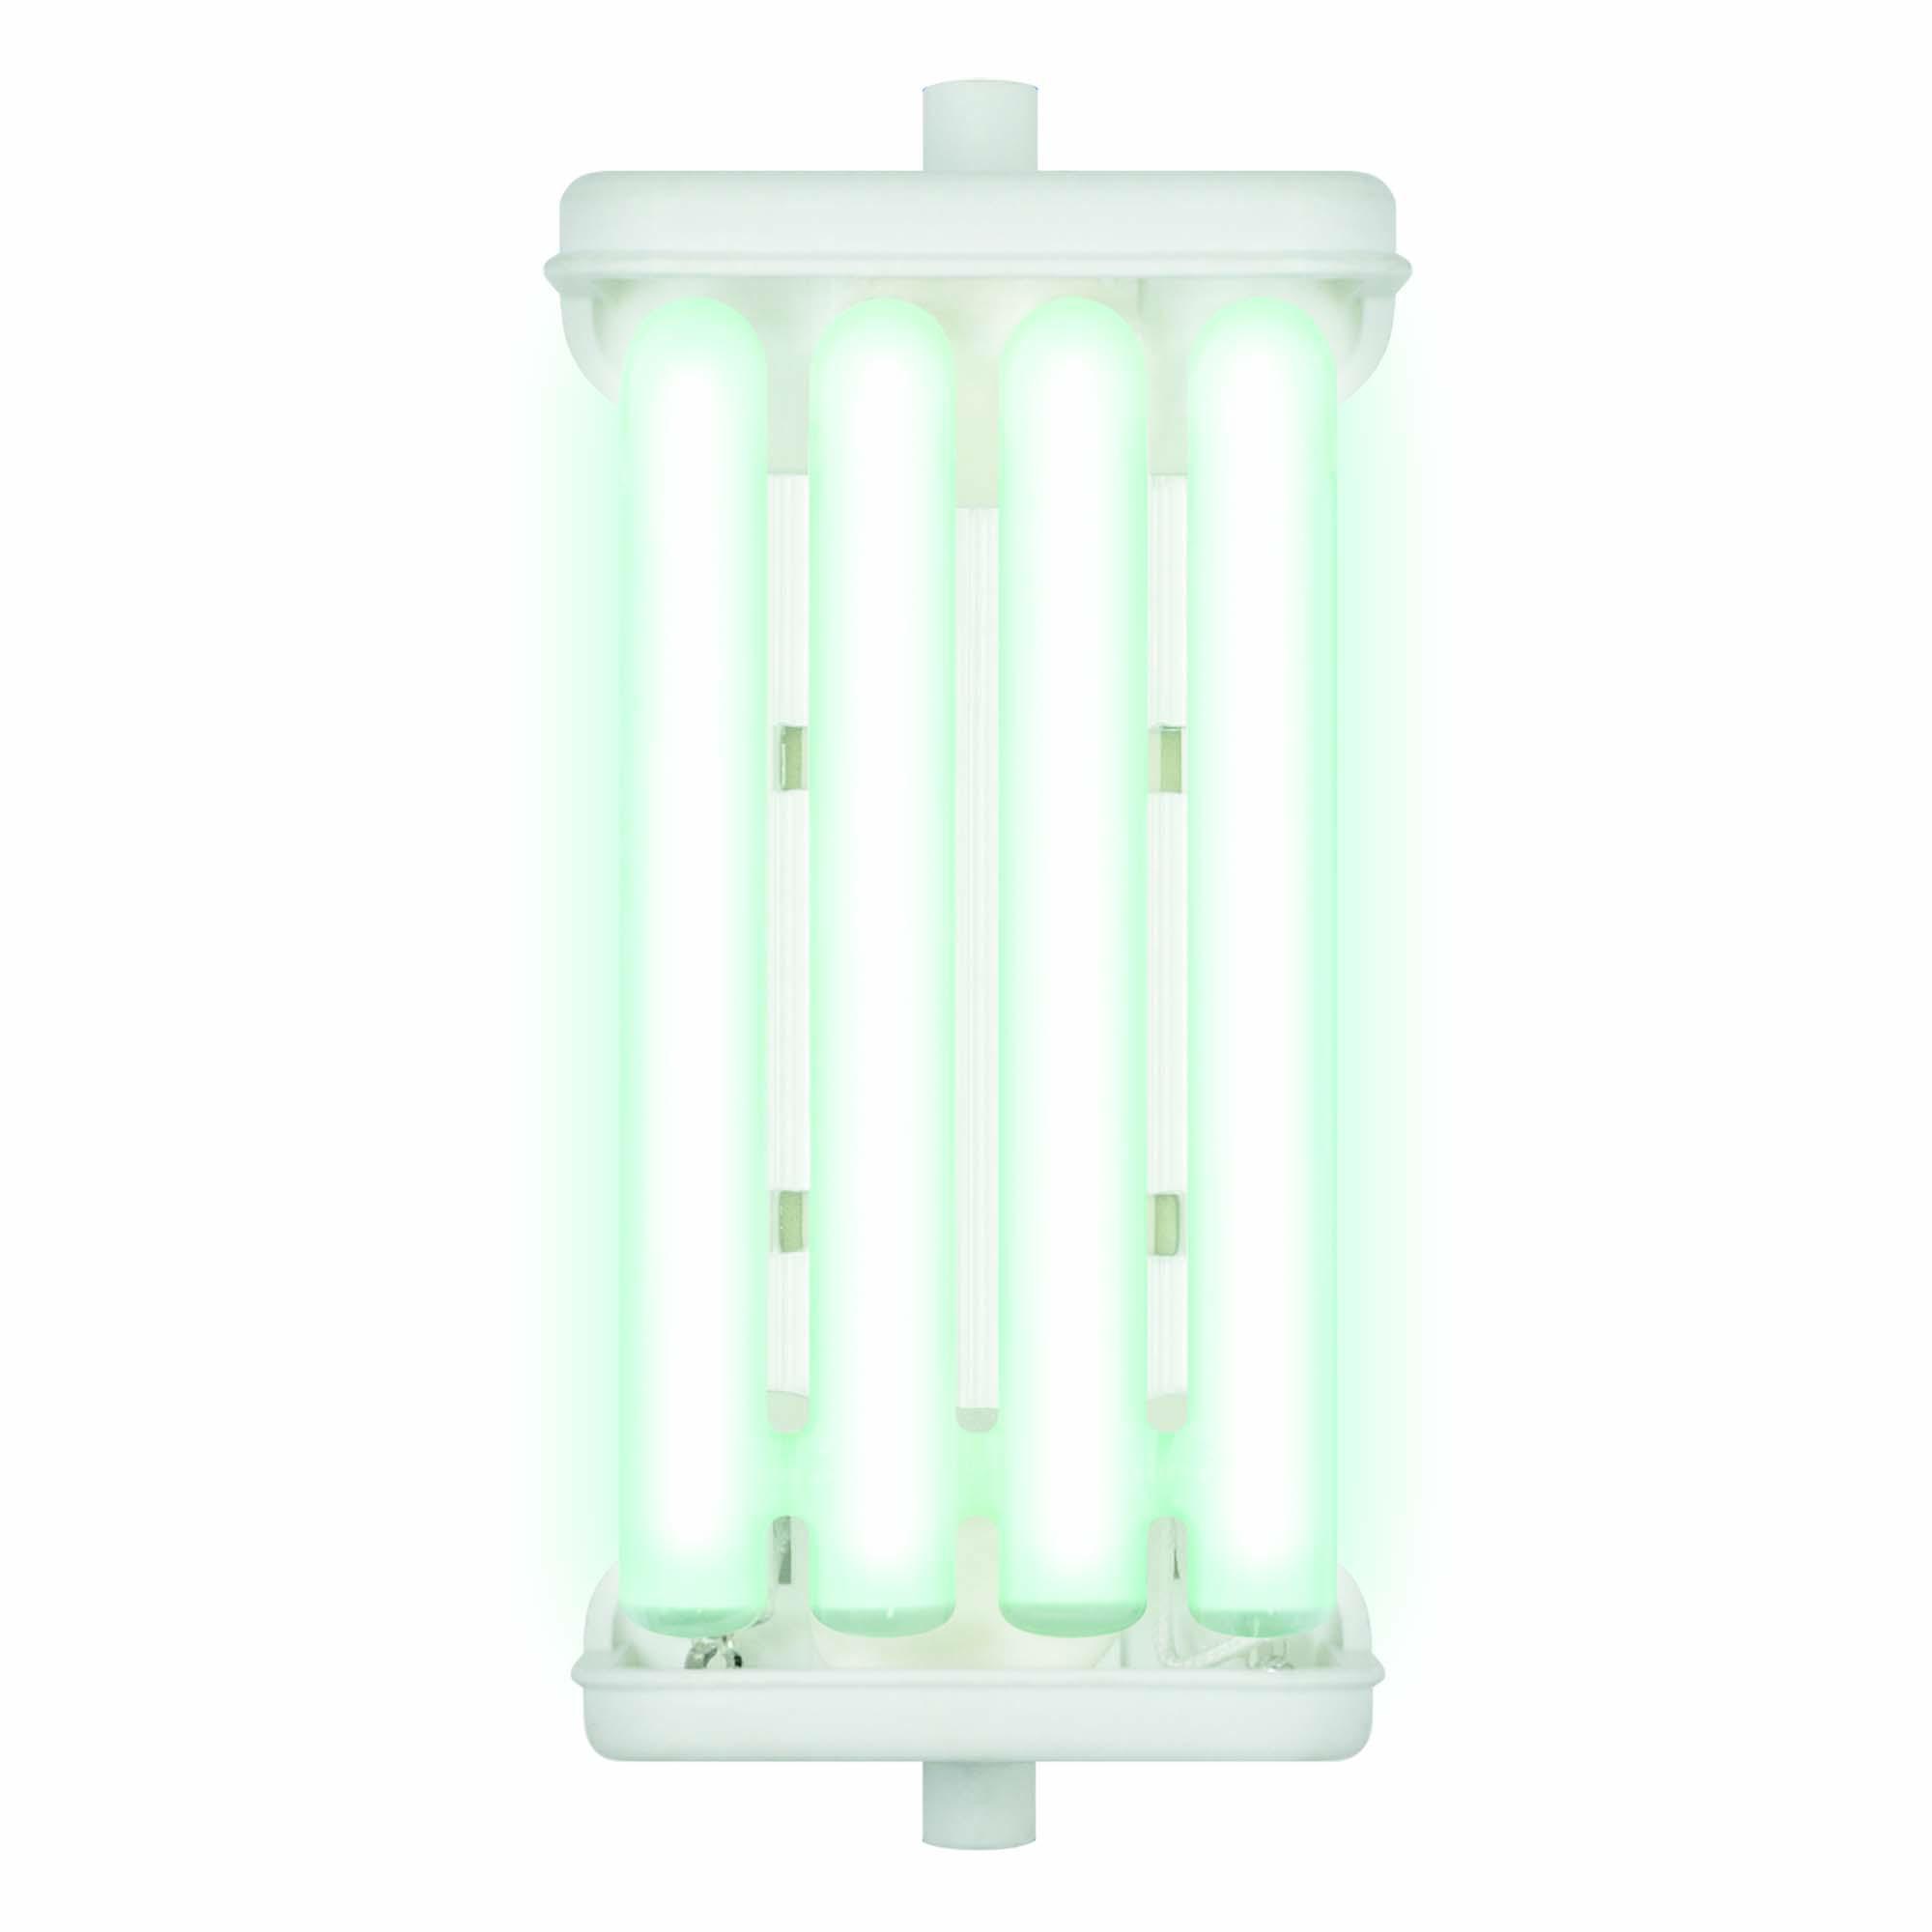 Лампа энергосберегающая Uniel Esl-422-j118-24/4000/r7s 100шт high quality ci 134 isa bus r s 422 485 100